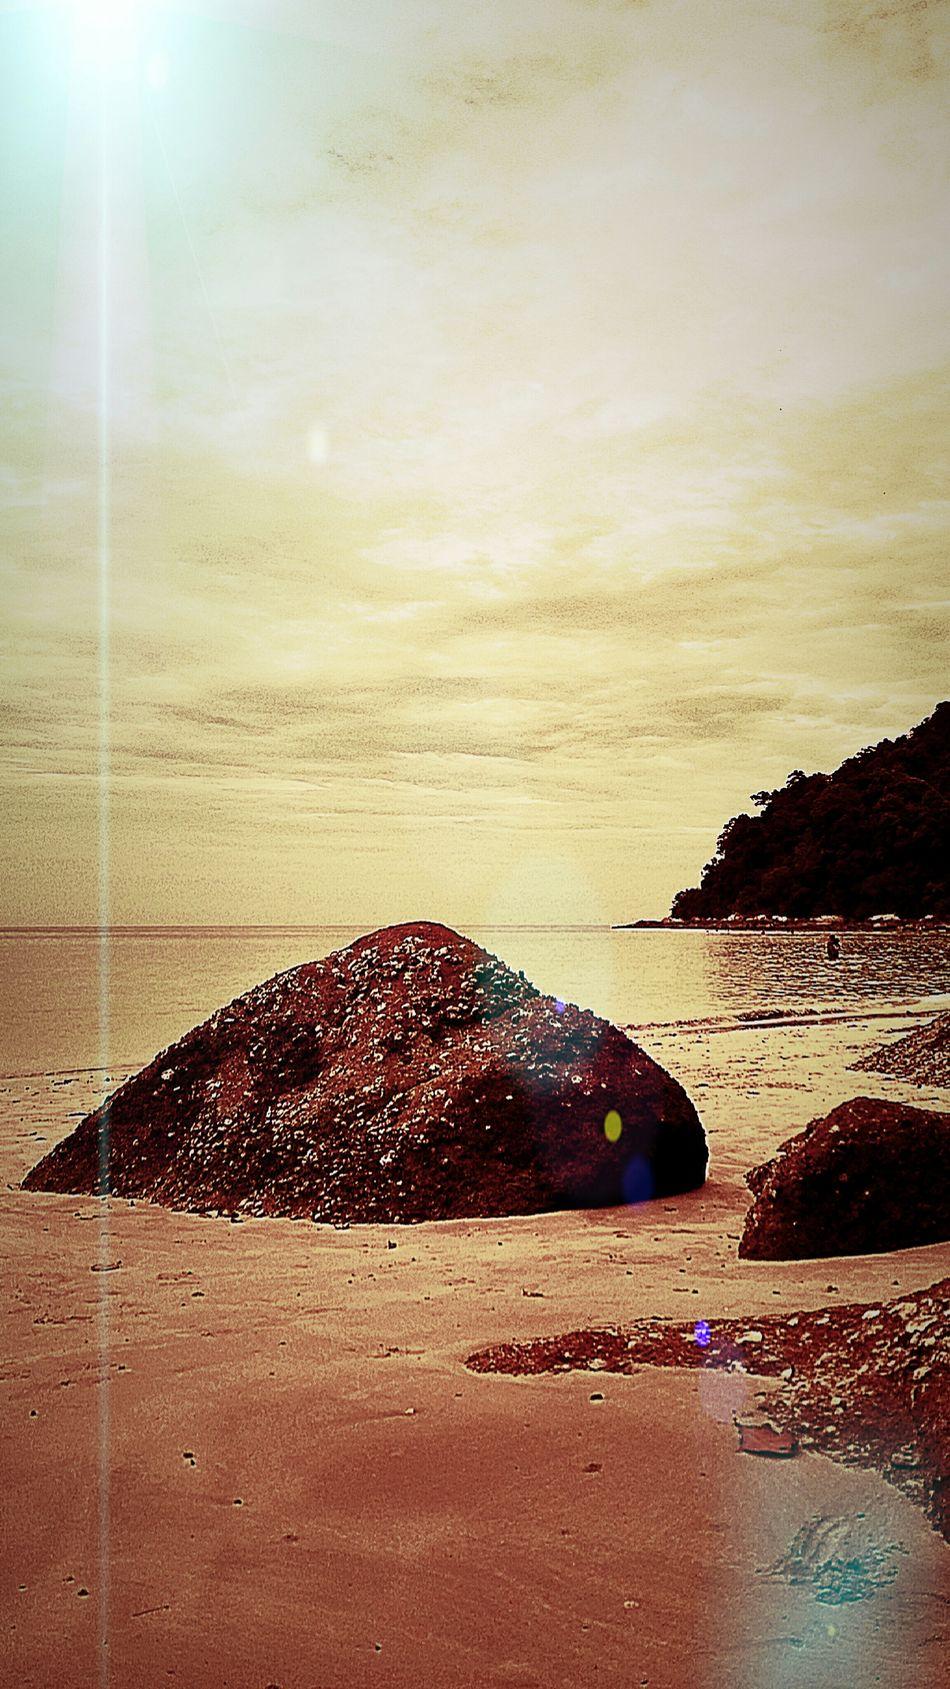 A rocky island Photography Island Vacation